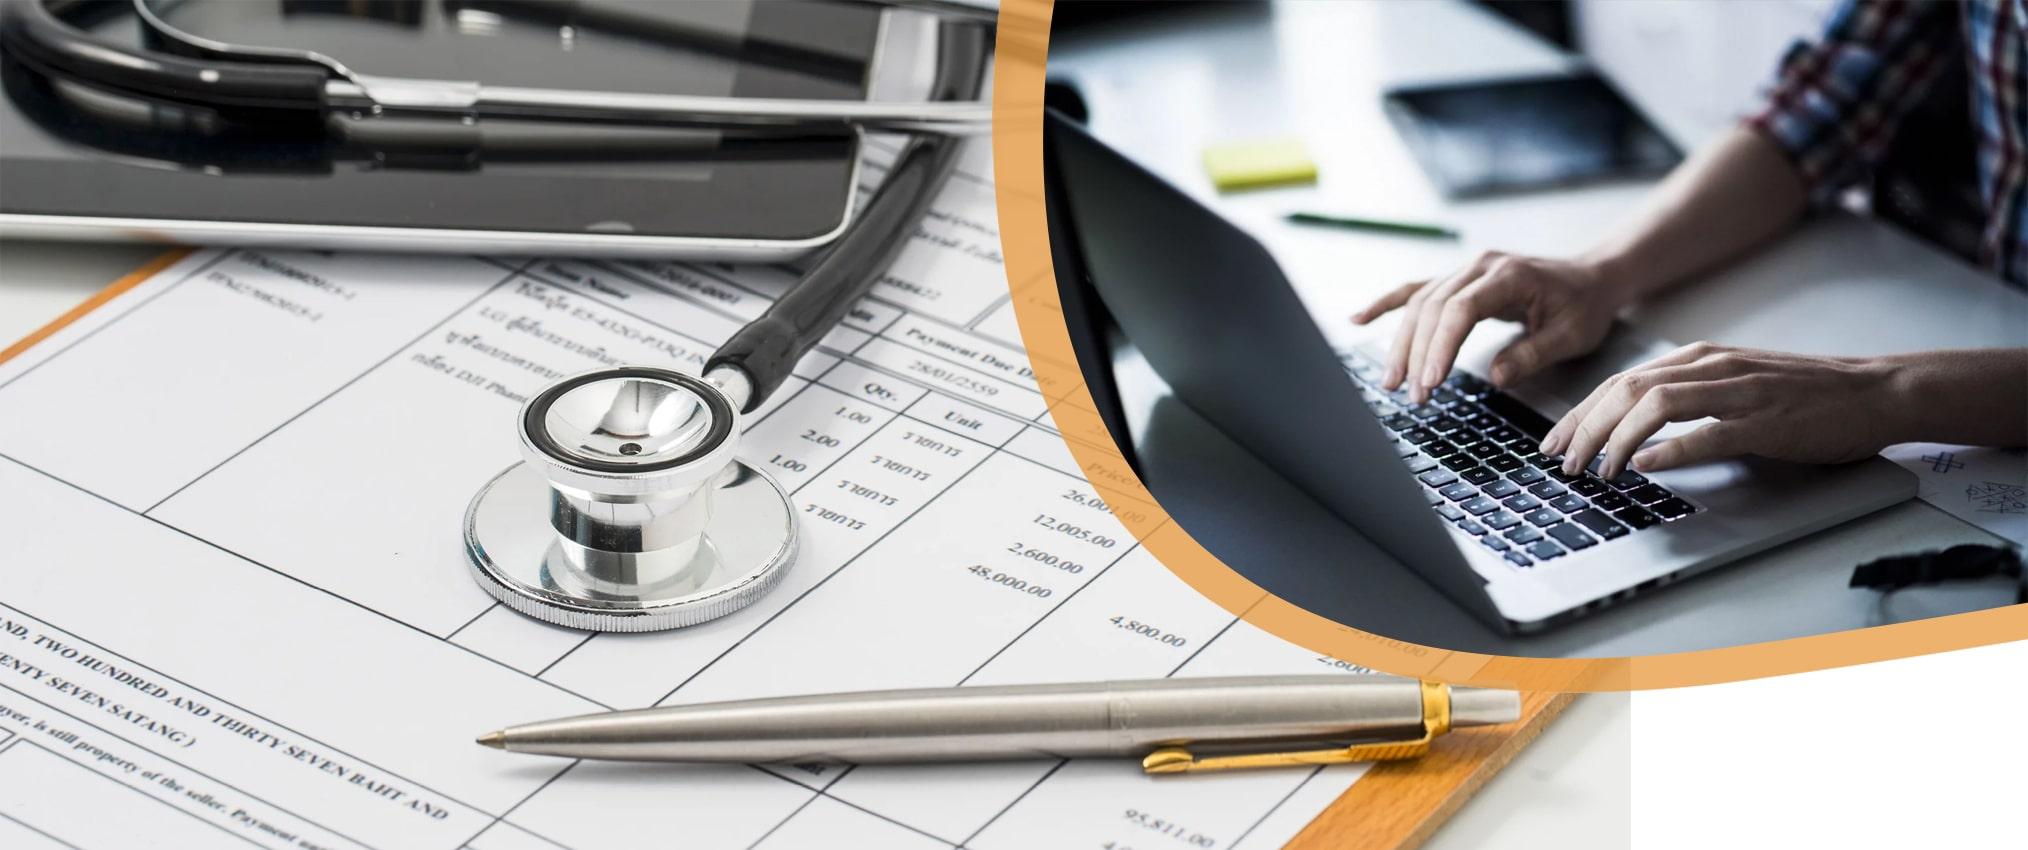 Should-you-consider-outsourcing-for-your-medical-billing